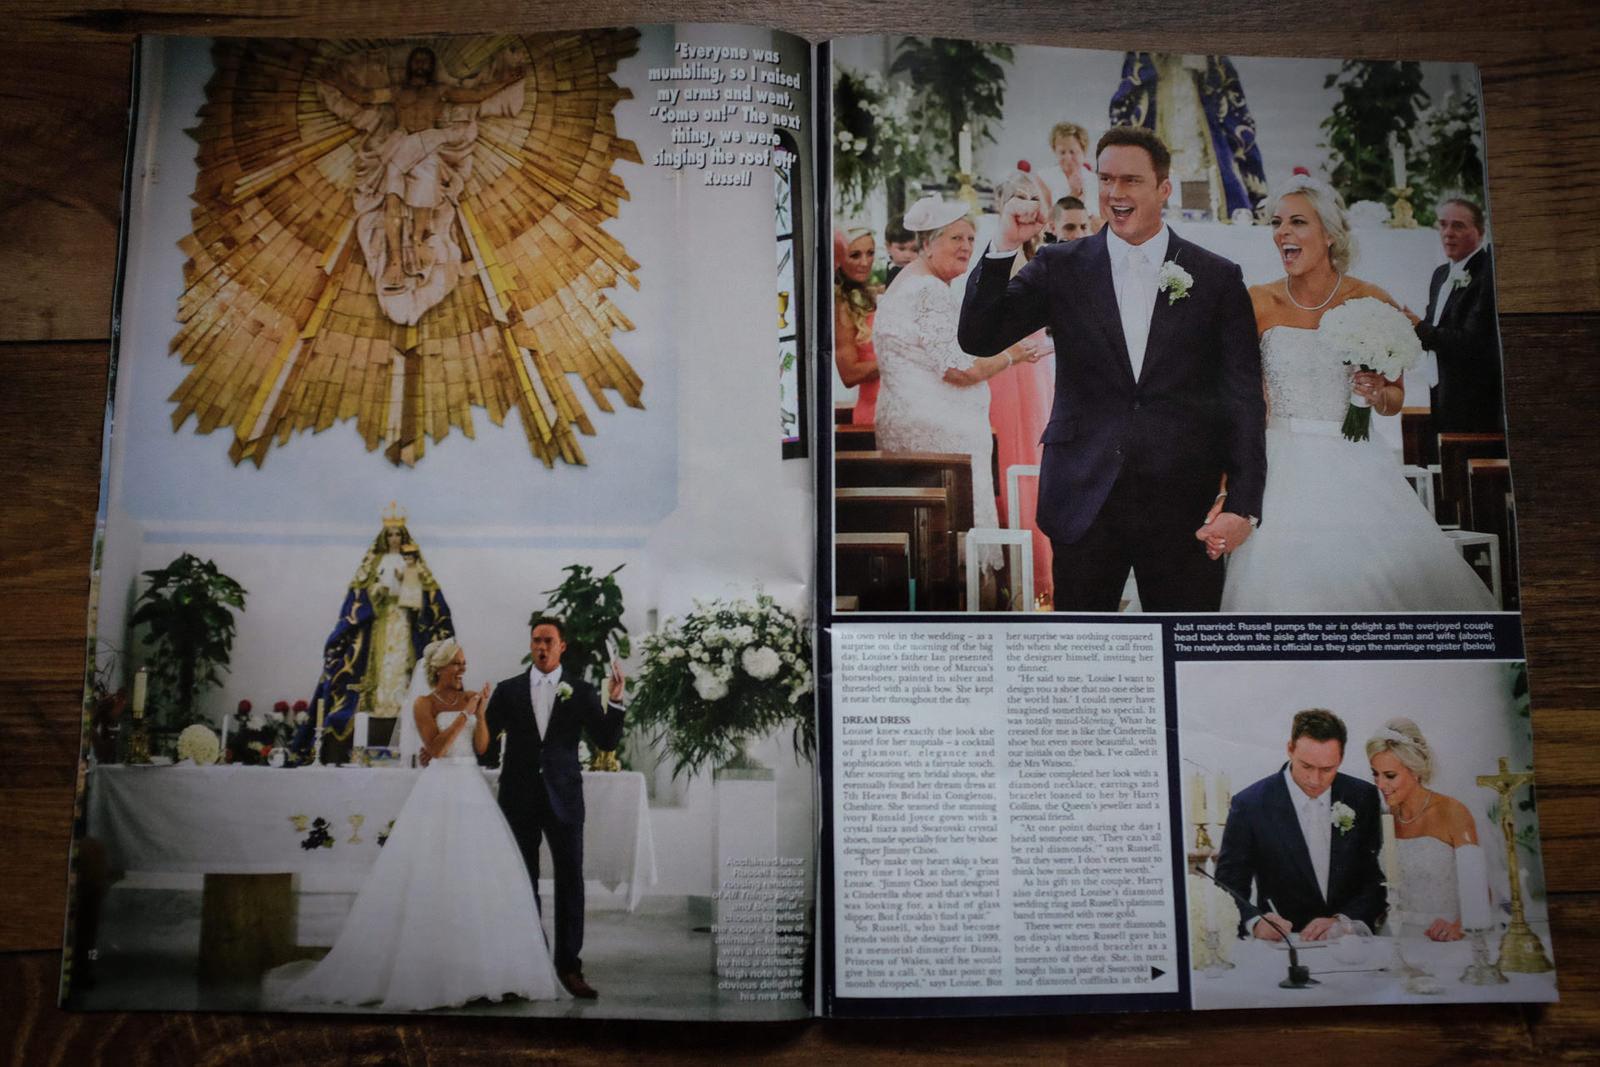 Liverpool celebrity wedding photographer Wes Simpson